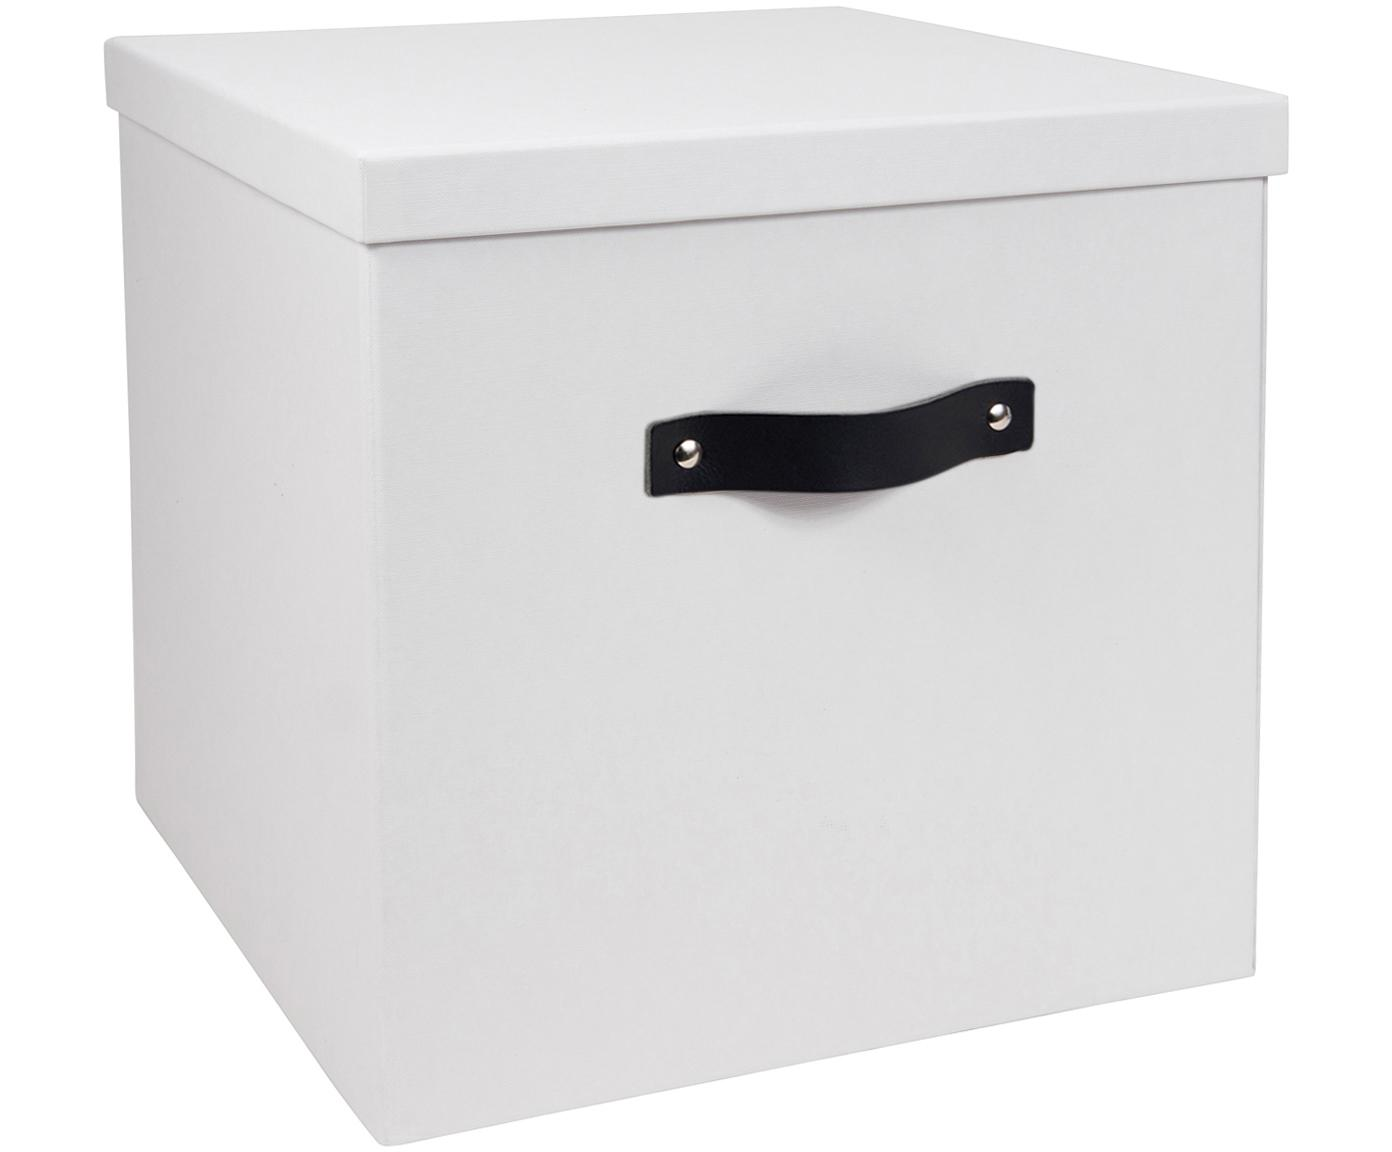 Aufbewahrungsbox Texas, Box: Fester, laminierter Karto, Griff: Leder, Weiss, 32 x 32 cm